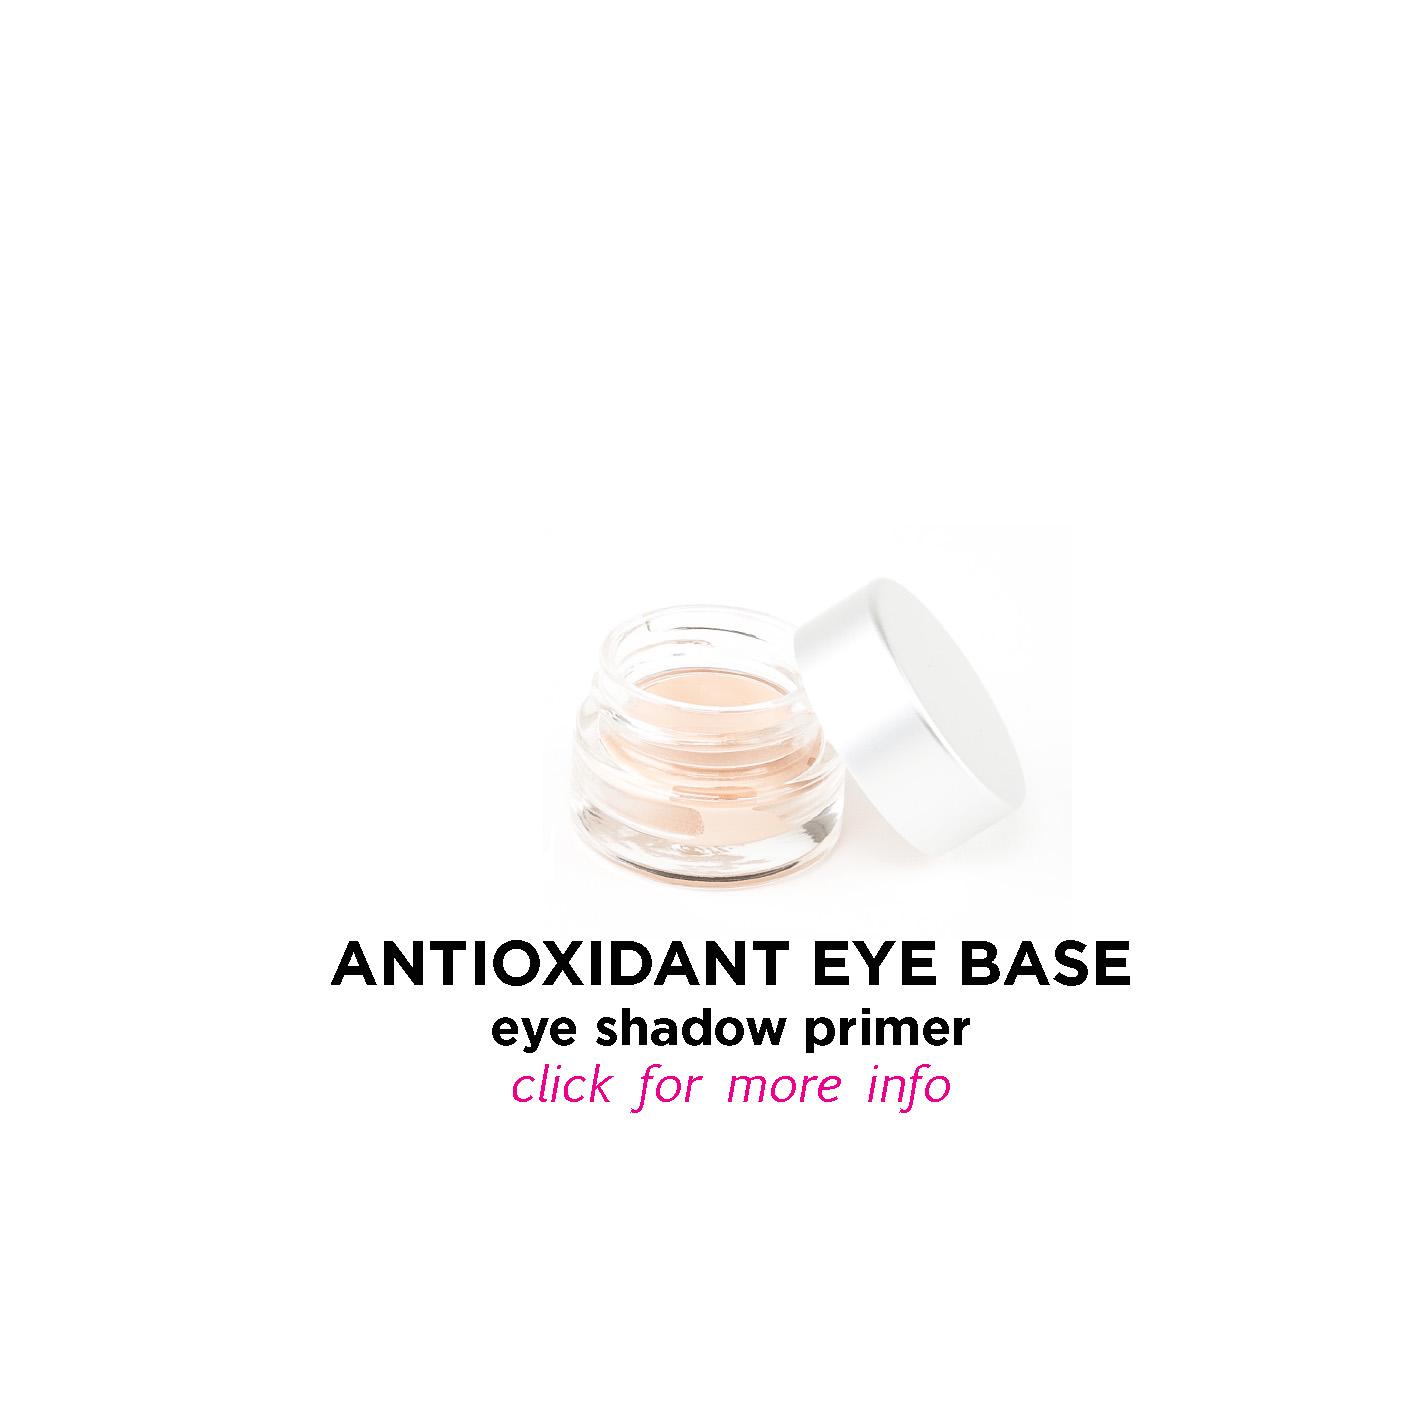 Antioxidant Eye Base